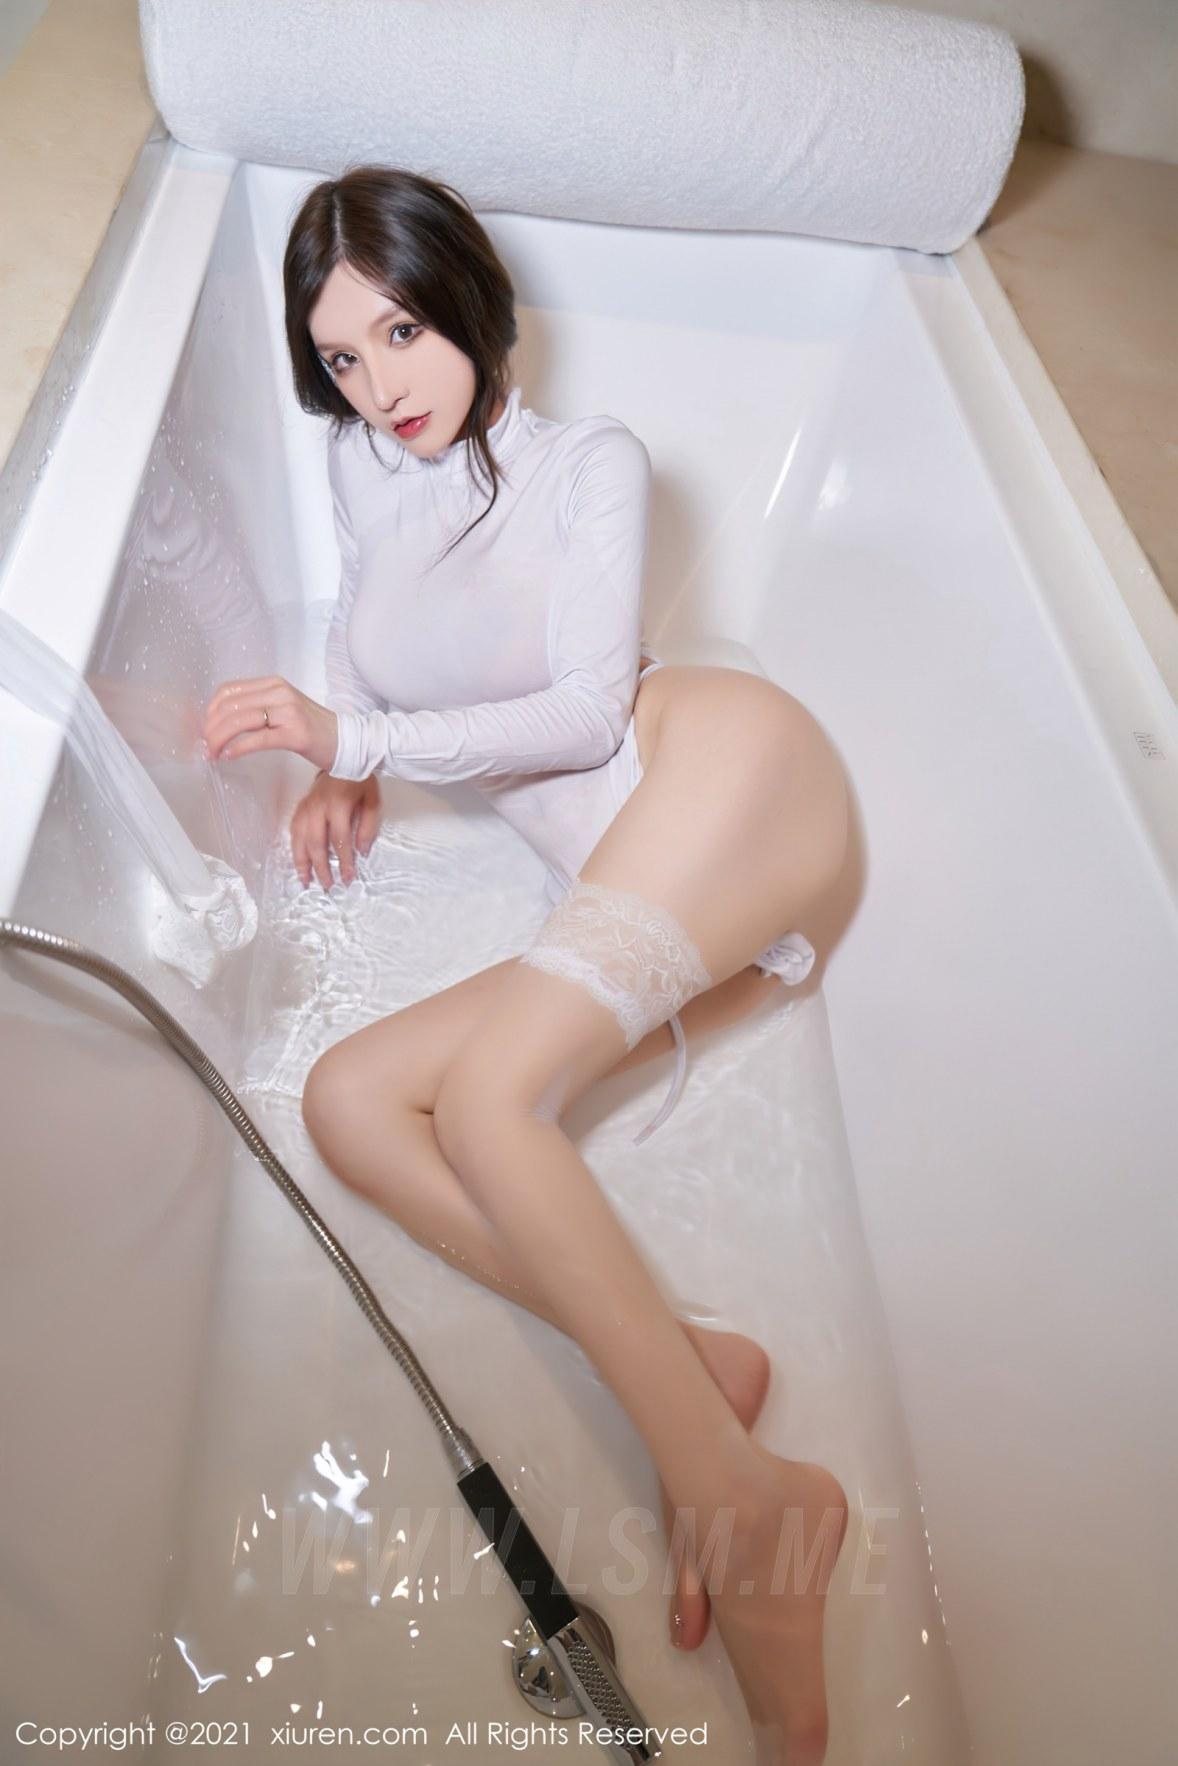 3680 093 ols 3603 5400 - XiuRen 秀人 No.3680 浴室蕾丝袜 周于希Sandy 性感写真111 - 秀人网 -【免费在线写真】【丽人丝语】